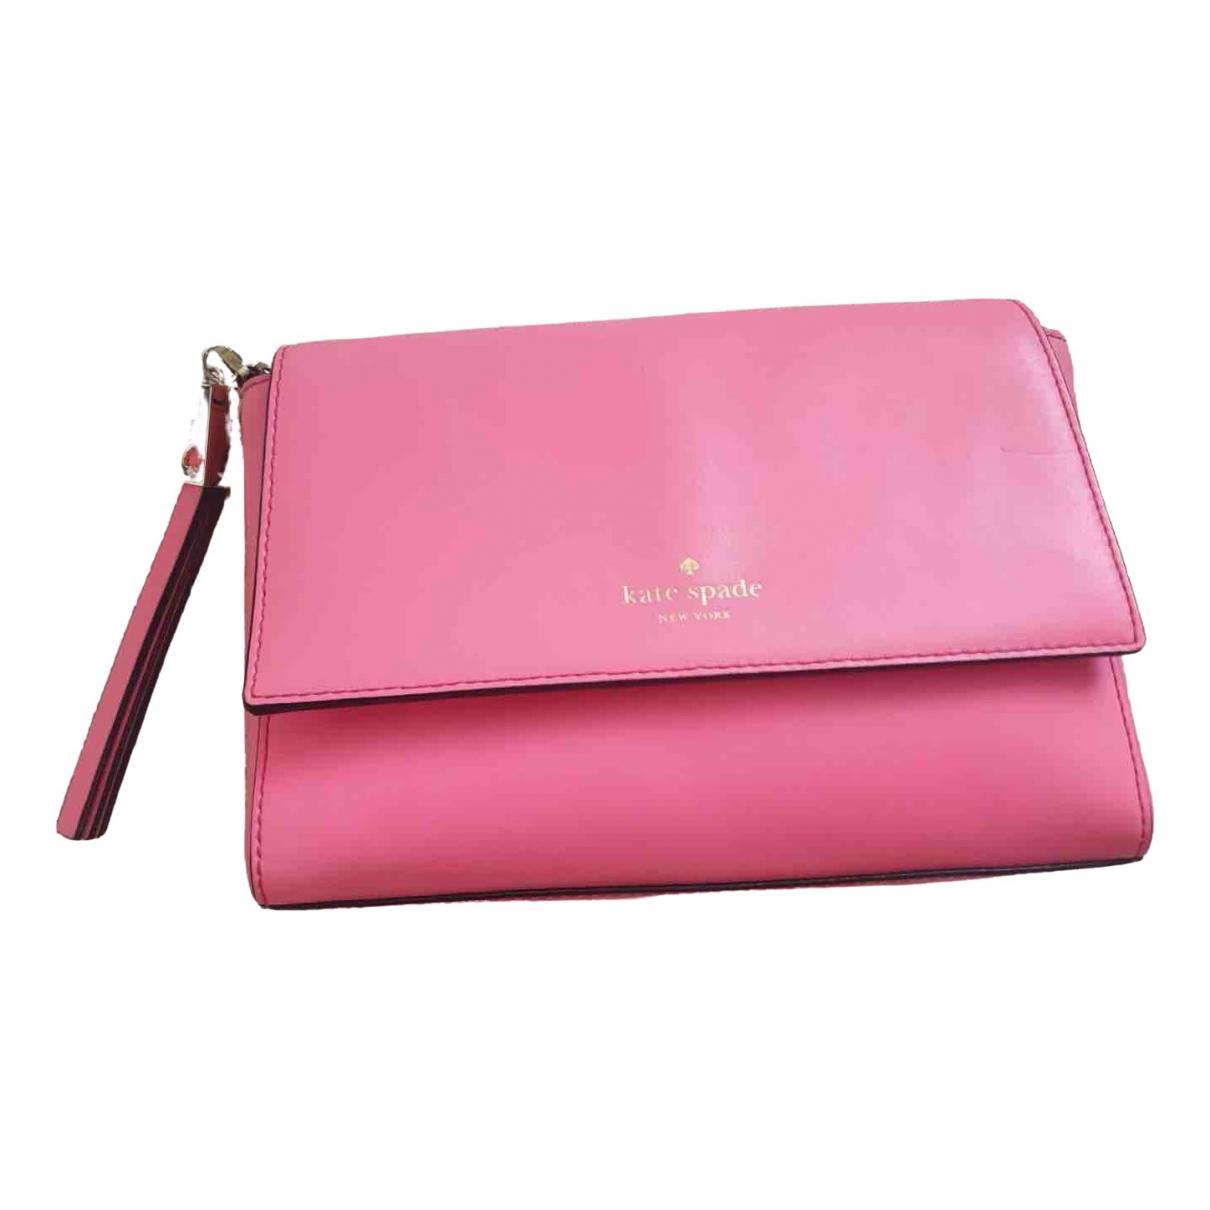 Kate Spade \N Pink Leather Clutch bag for Women \N